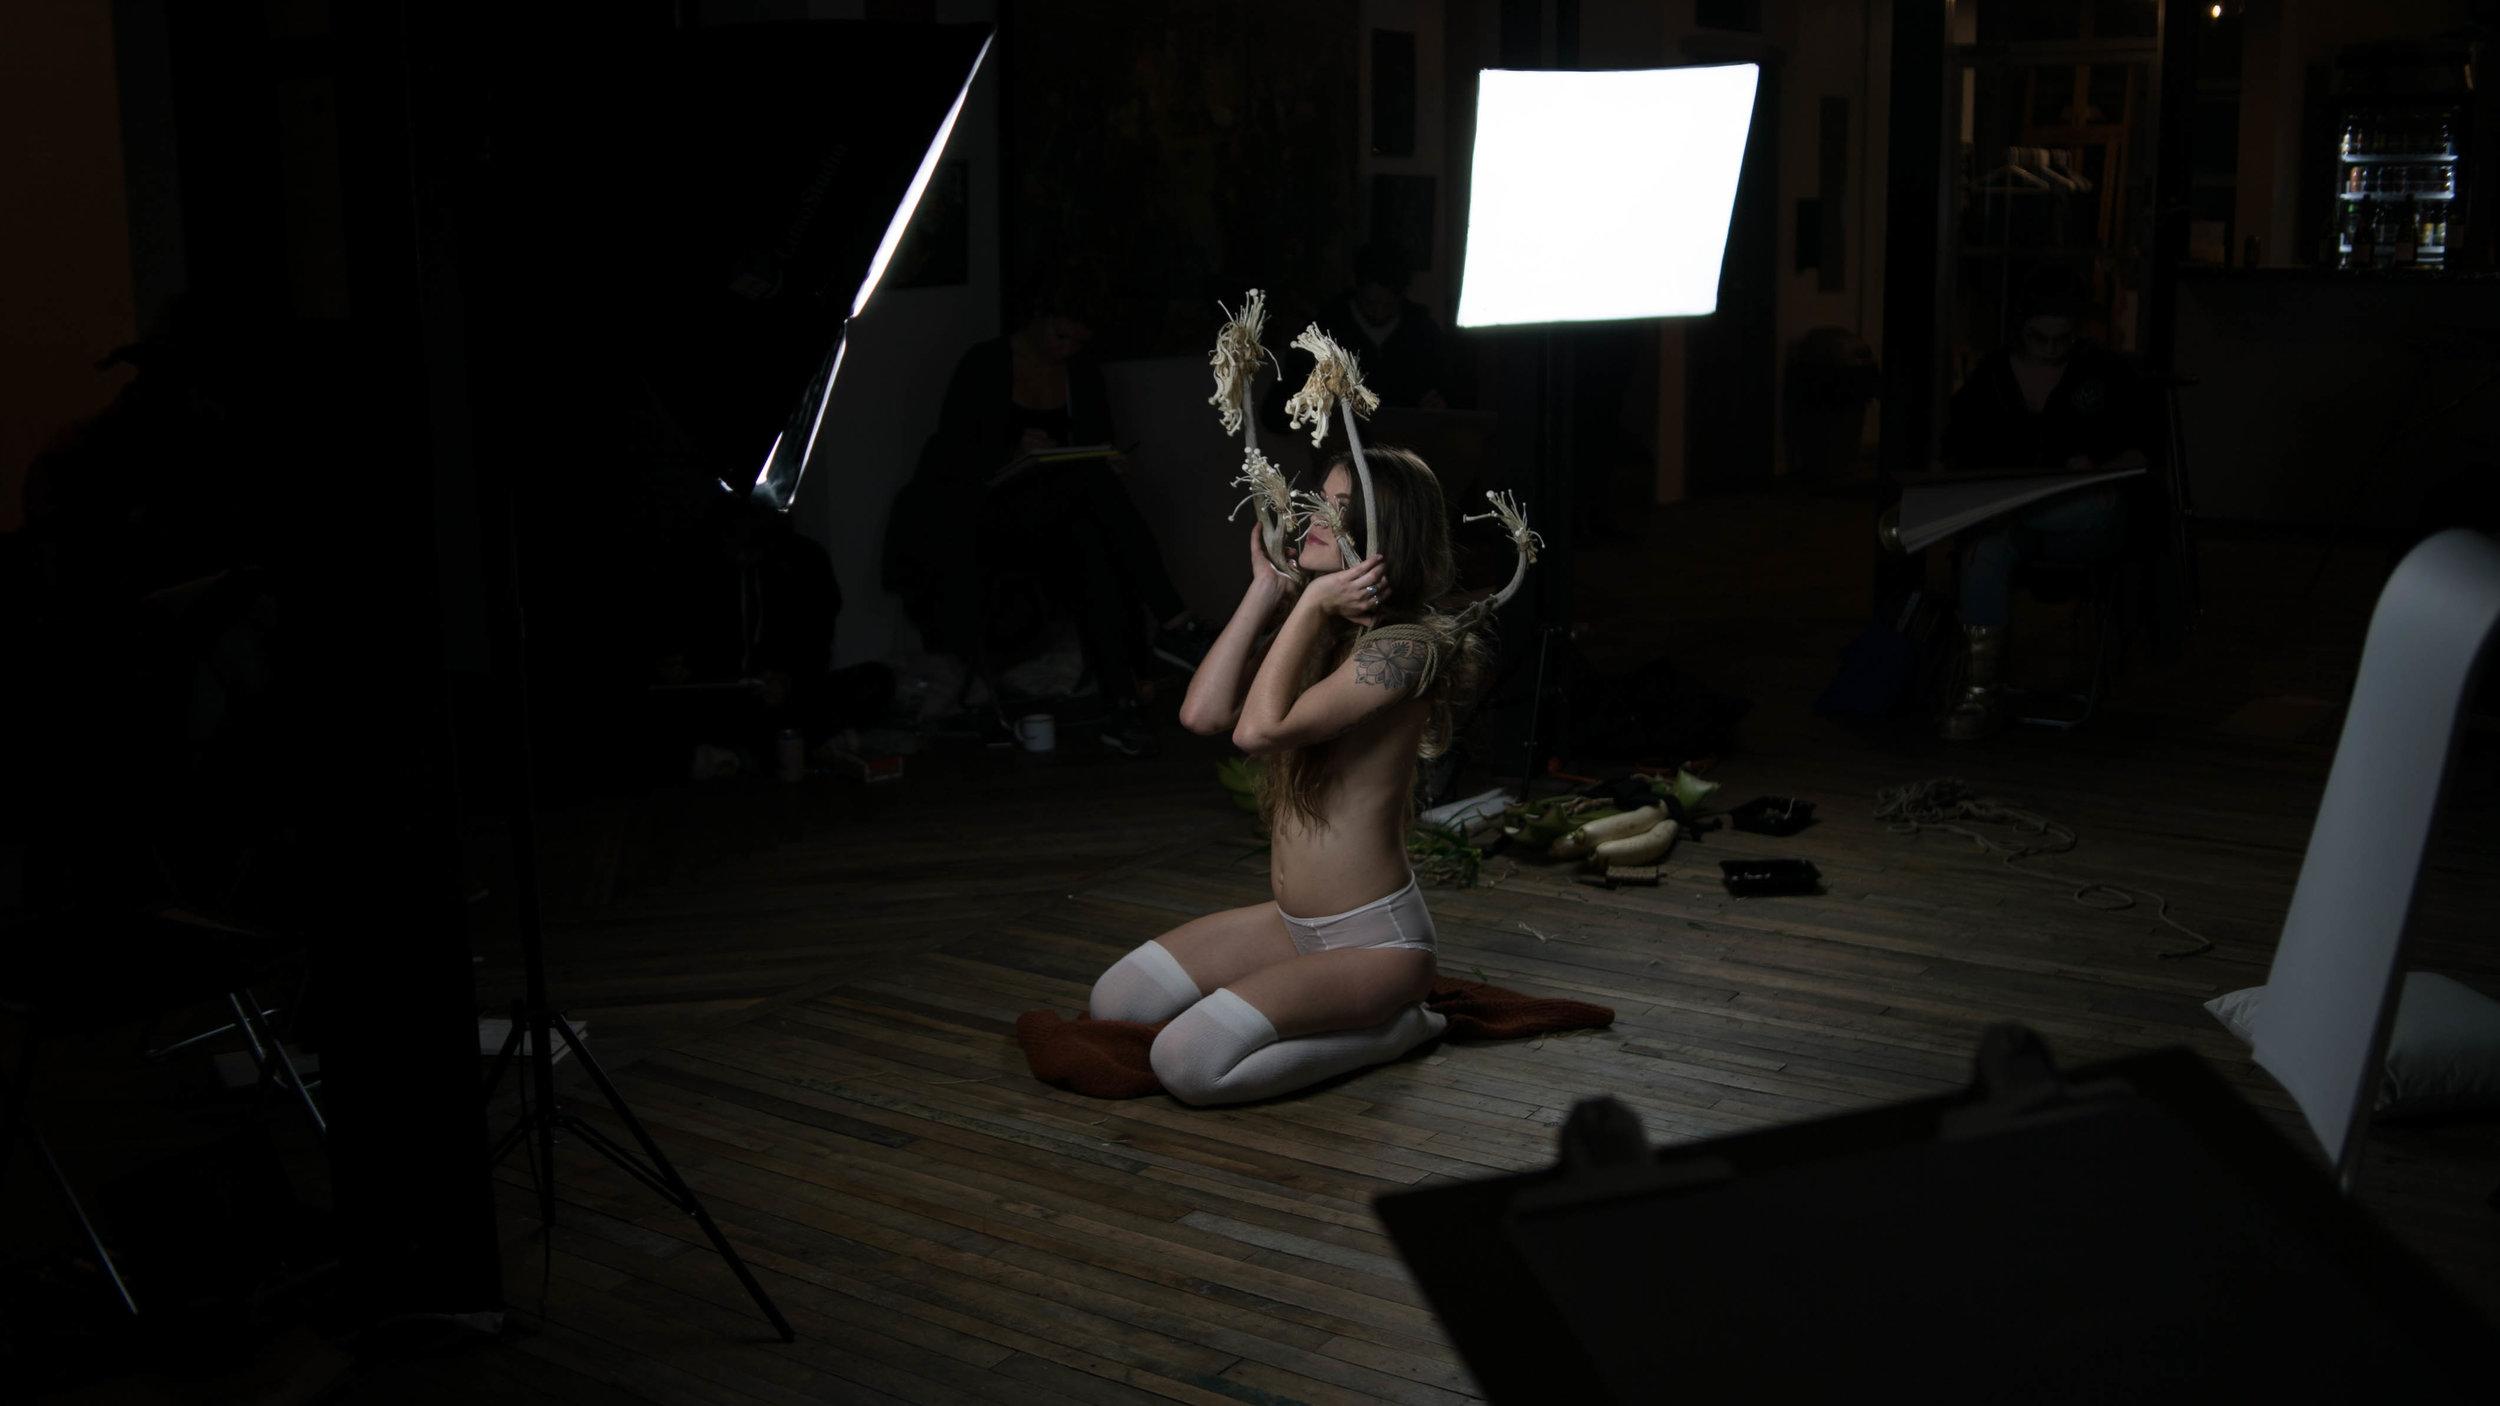 oliver franklin anderson, reindeer, caribou, antlers, rack, red, mushrooms, bondage, tied, decorative, shroom, fungi, fashion film, bdsm, rope, twisted monk, figure drawing, life drawing, prop, nature, natural, design, radish, erotic, appleton, wisconsin, deer, bones, kneeling, fashion photography, fashion, styling